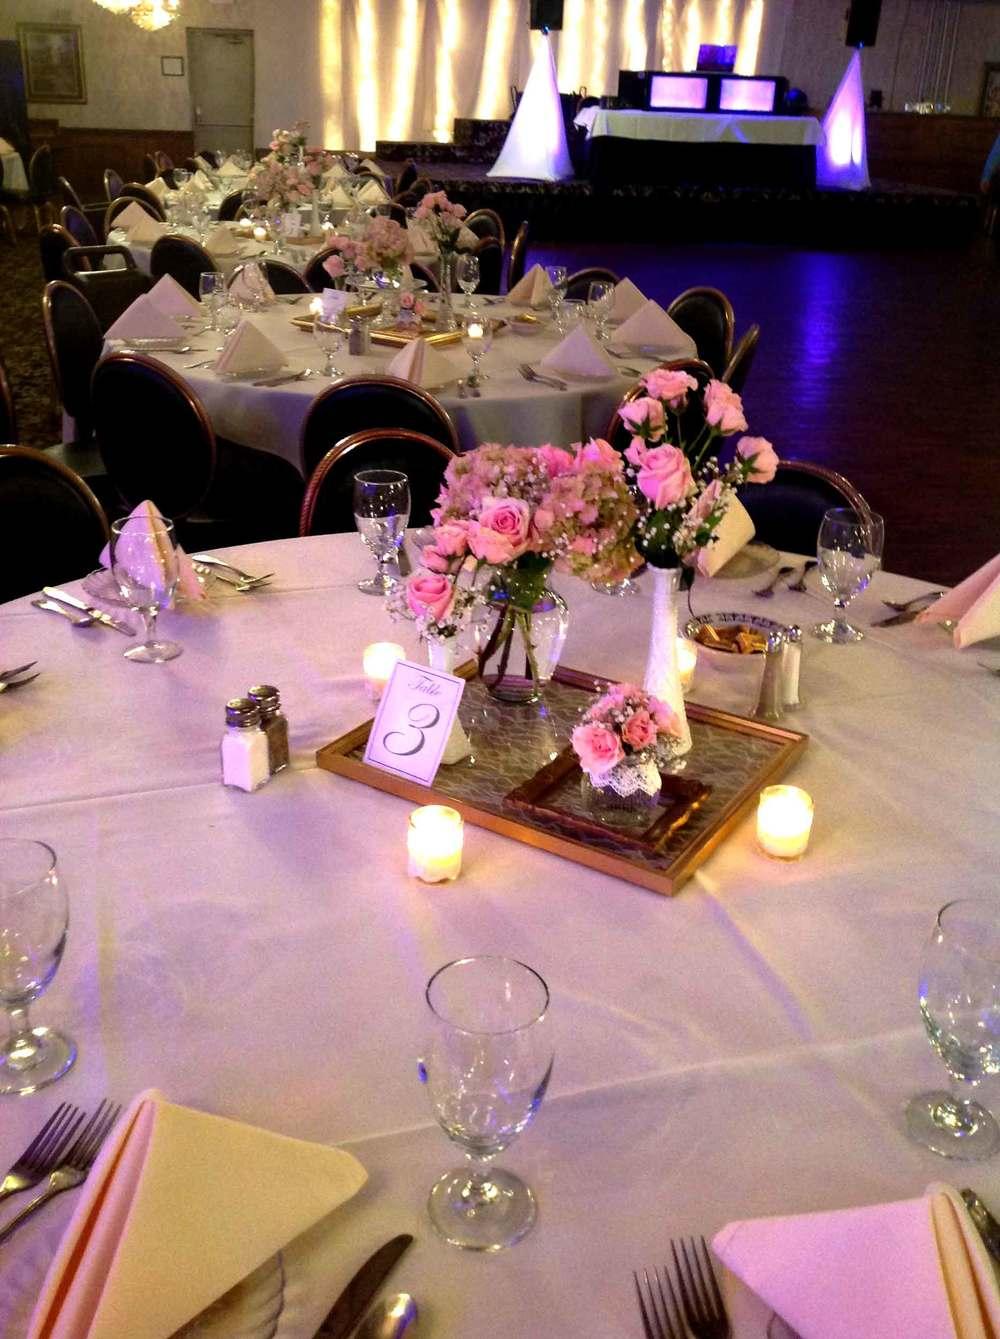 tiff-pink-flowers-tableset.jpg